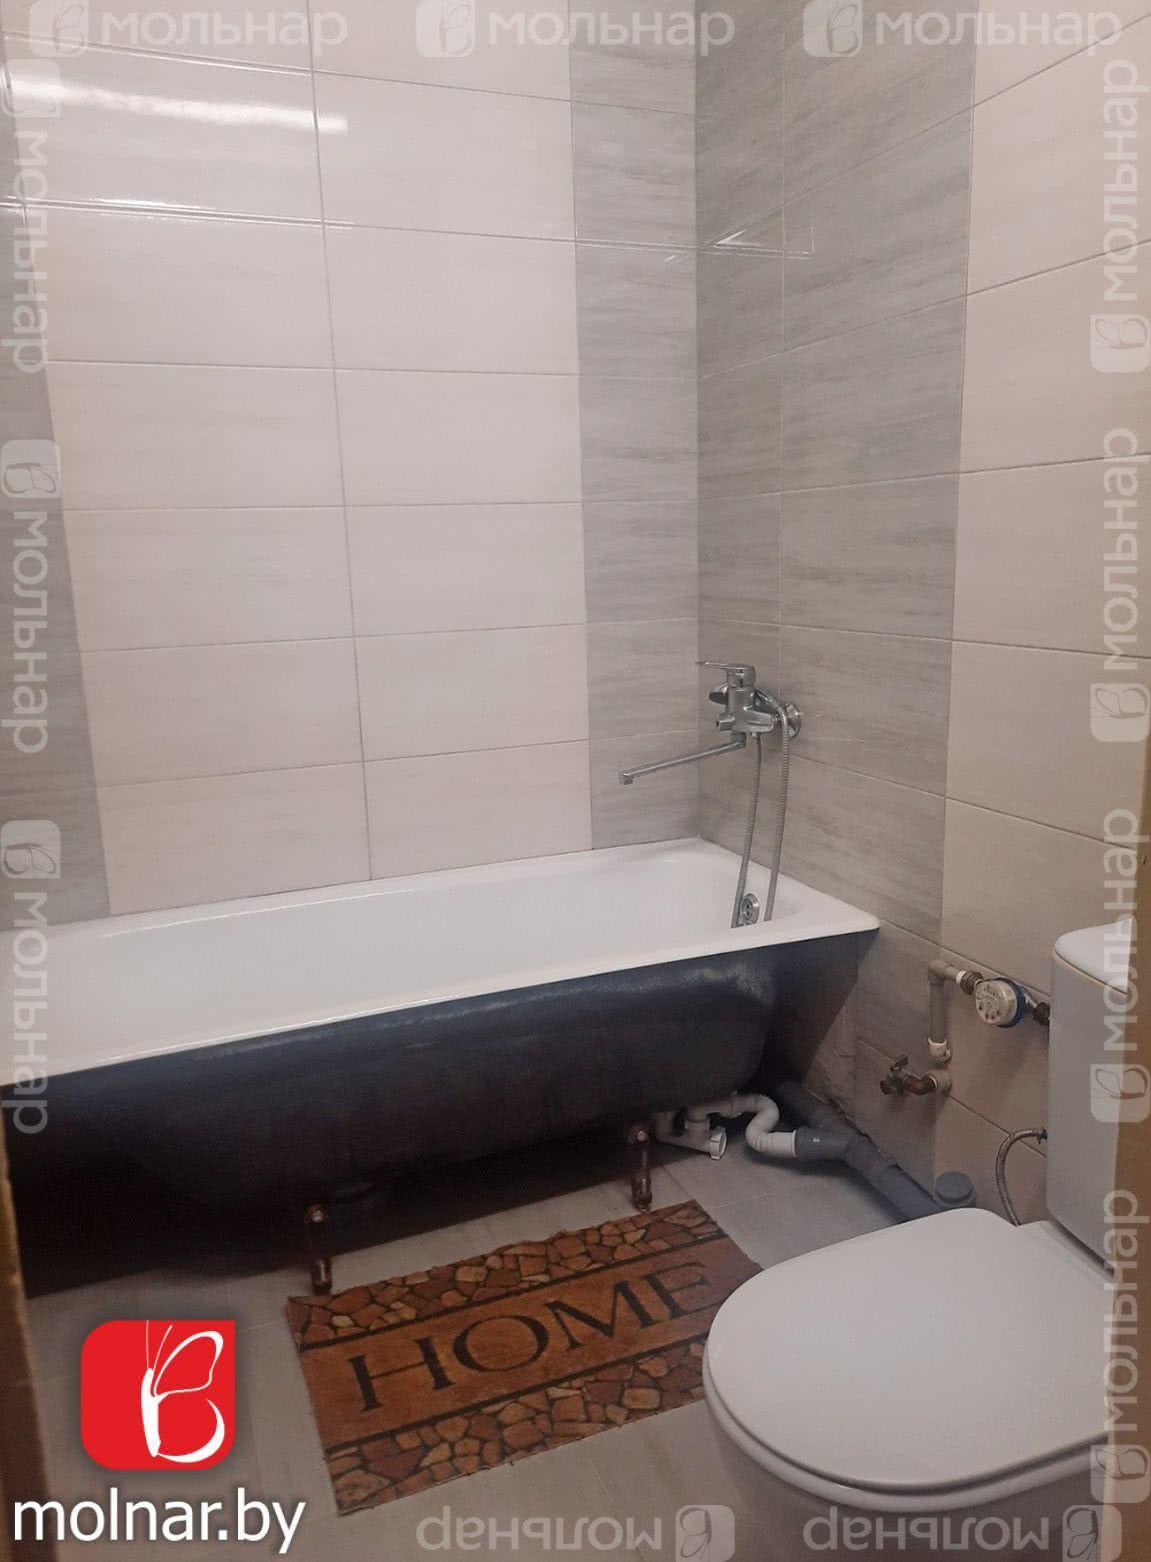 Купить 1-комнатную квартиру в Минске, ул. Маяковского, д. 188 - фото 2